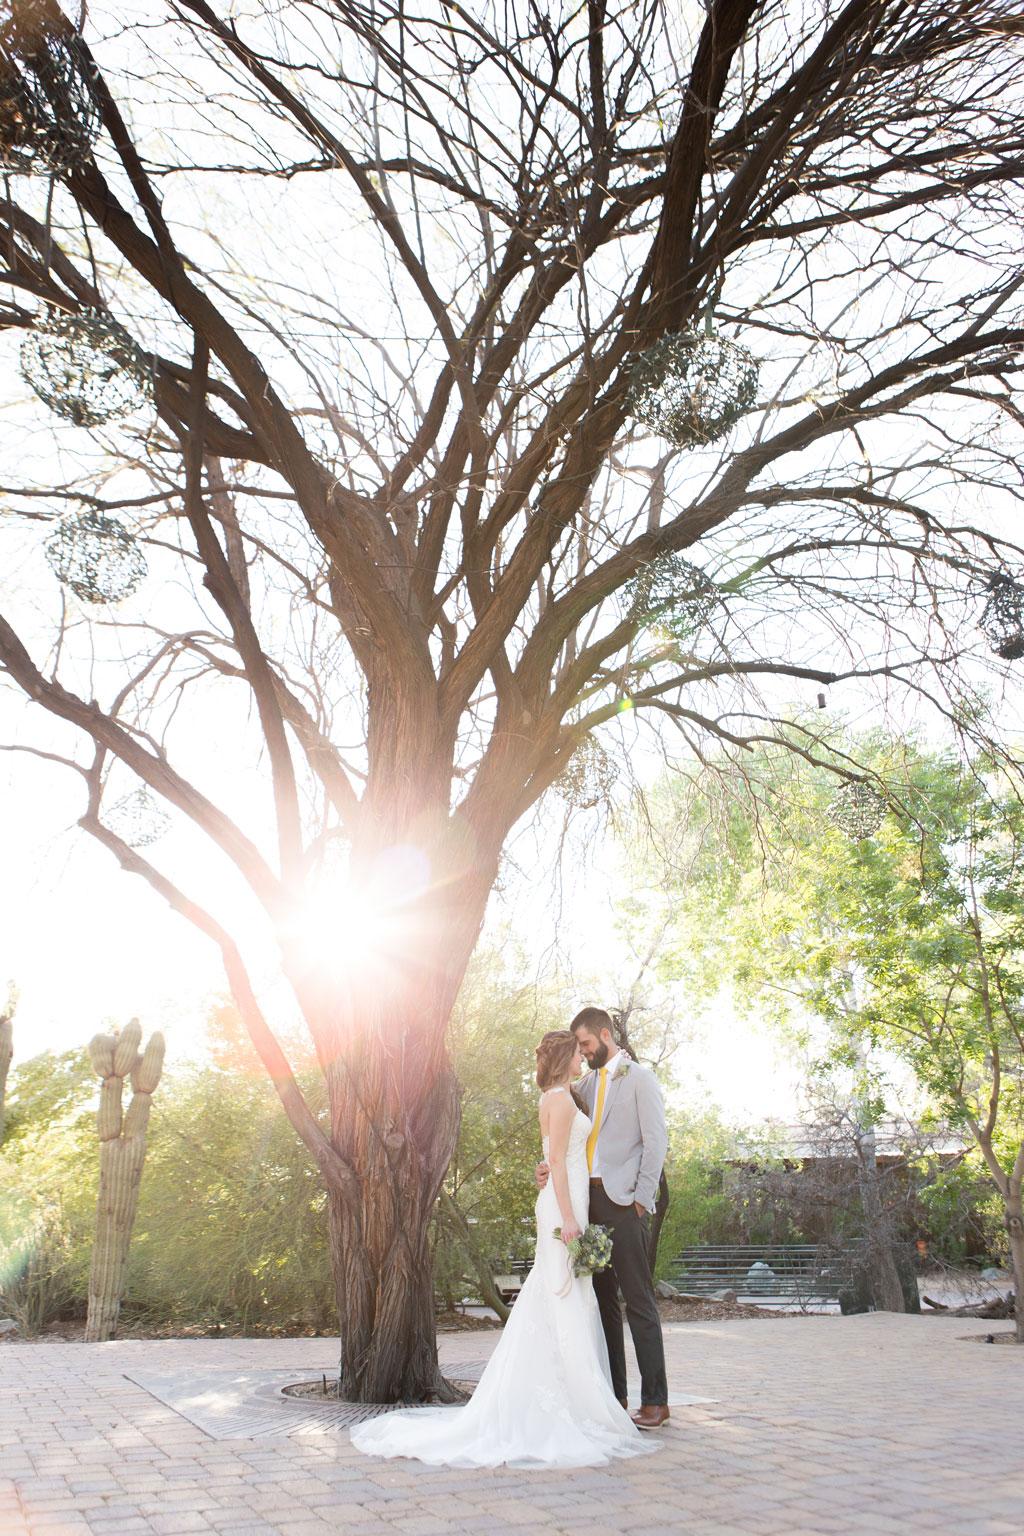 wedding at the phoenix zoo has beautiful scenery